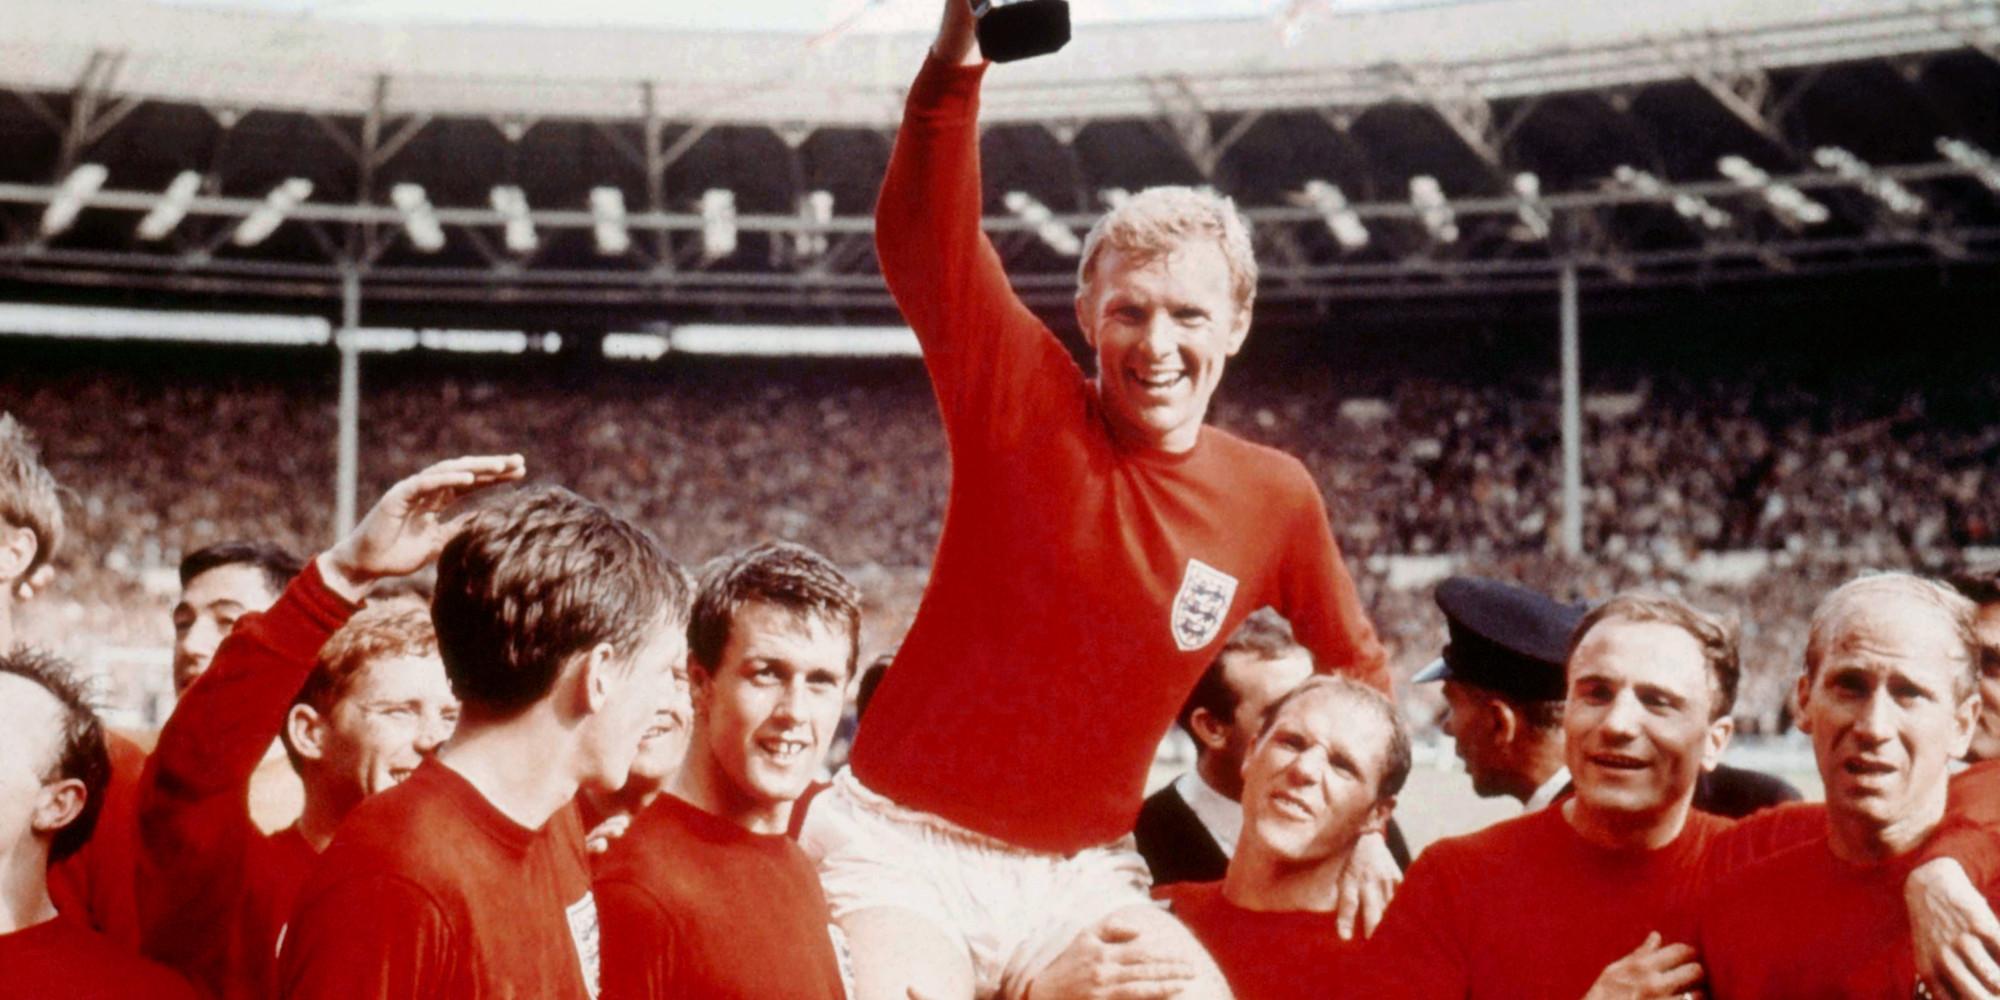 https://i2.wp.com/i.huffpost.com/gen/1836074/images/o-1966-WORLD-CUP-FINAL-facebook.jpg